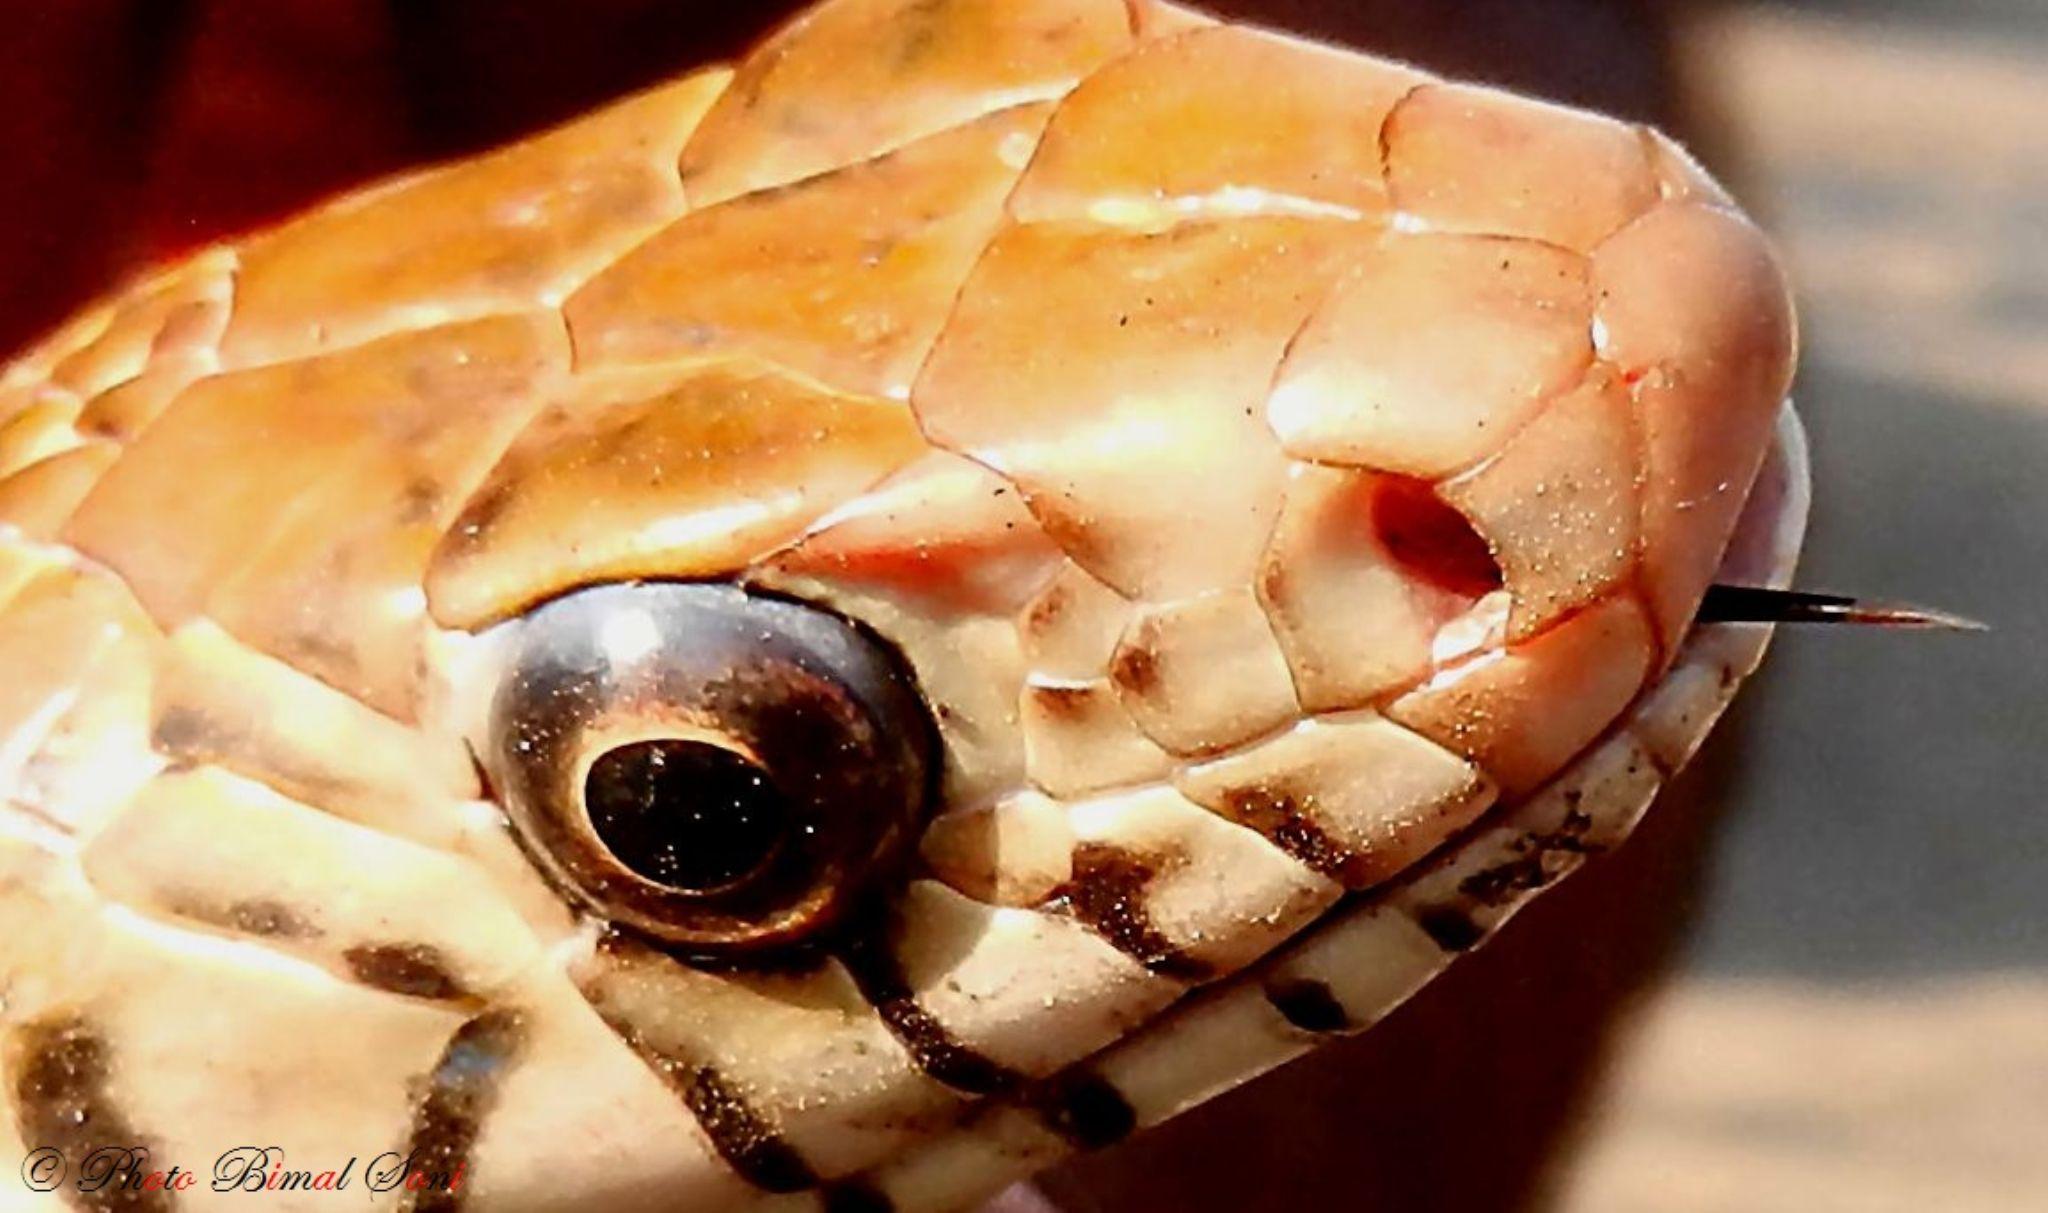 Rat_Snake by Bimal Soni